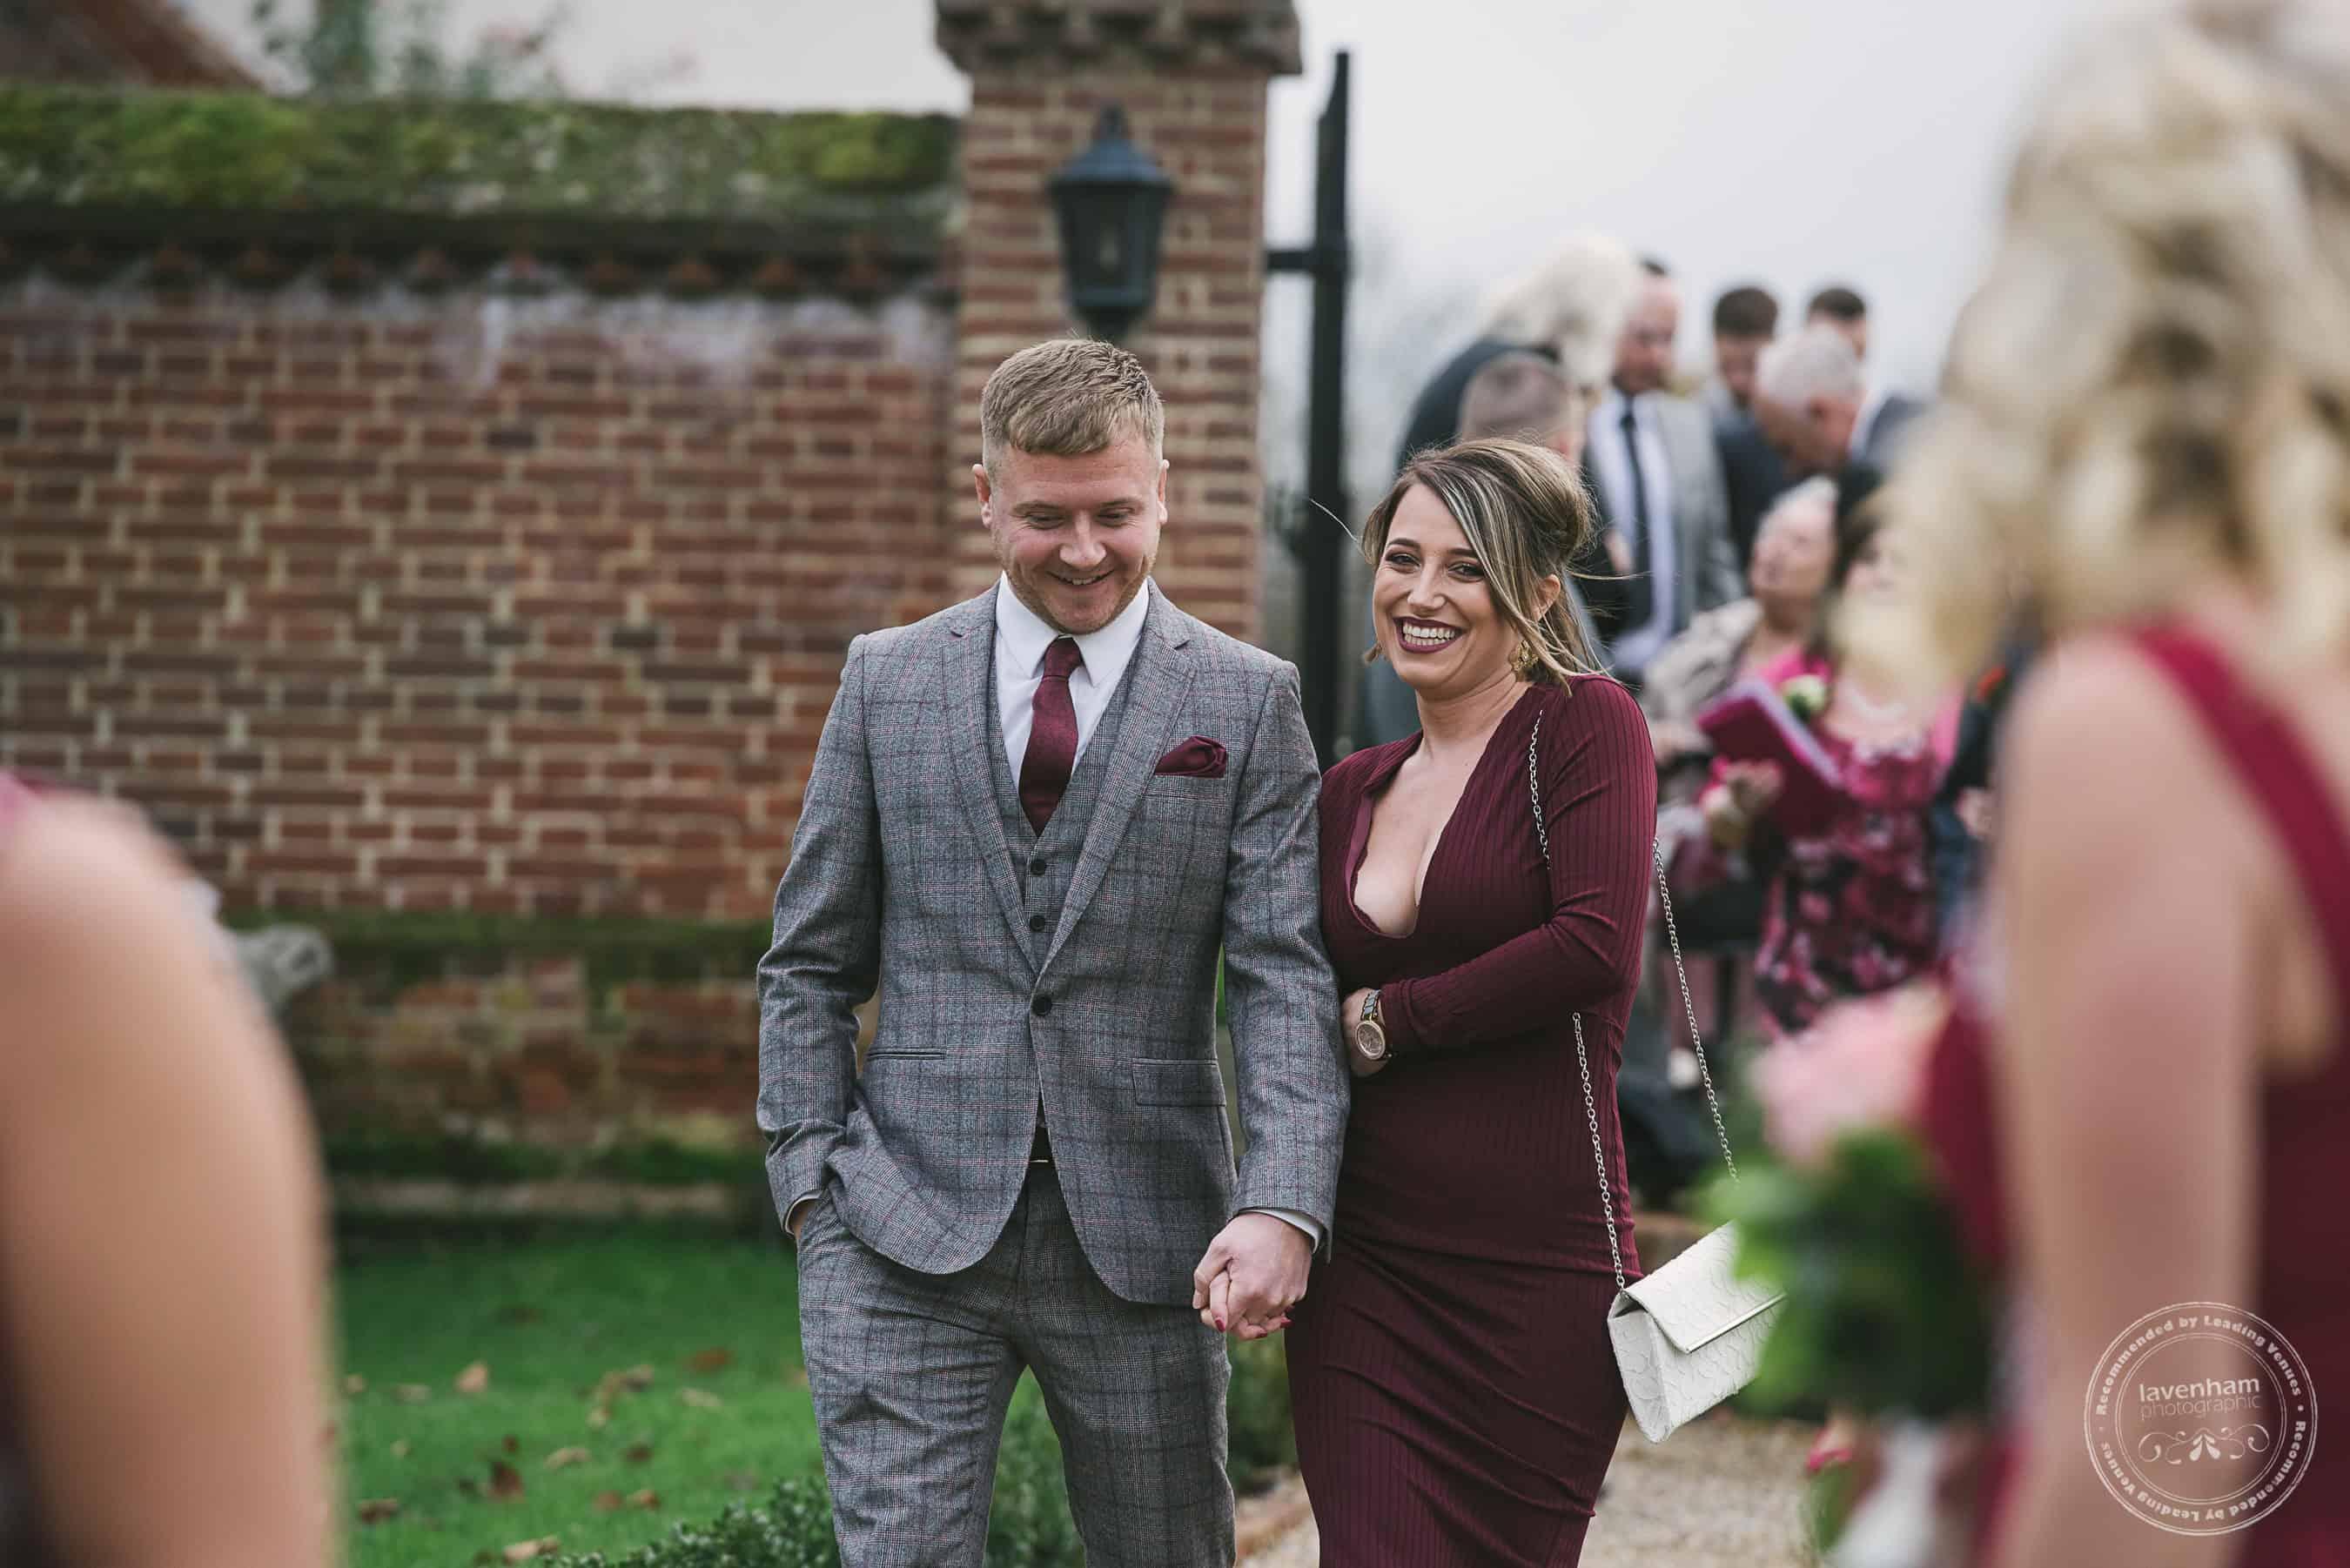 251118 Leez Priory Wedding Photography by Lavenham Photographic 059